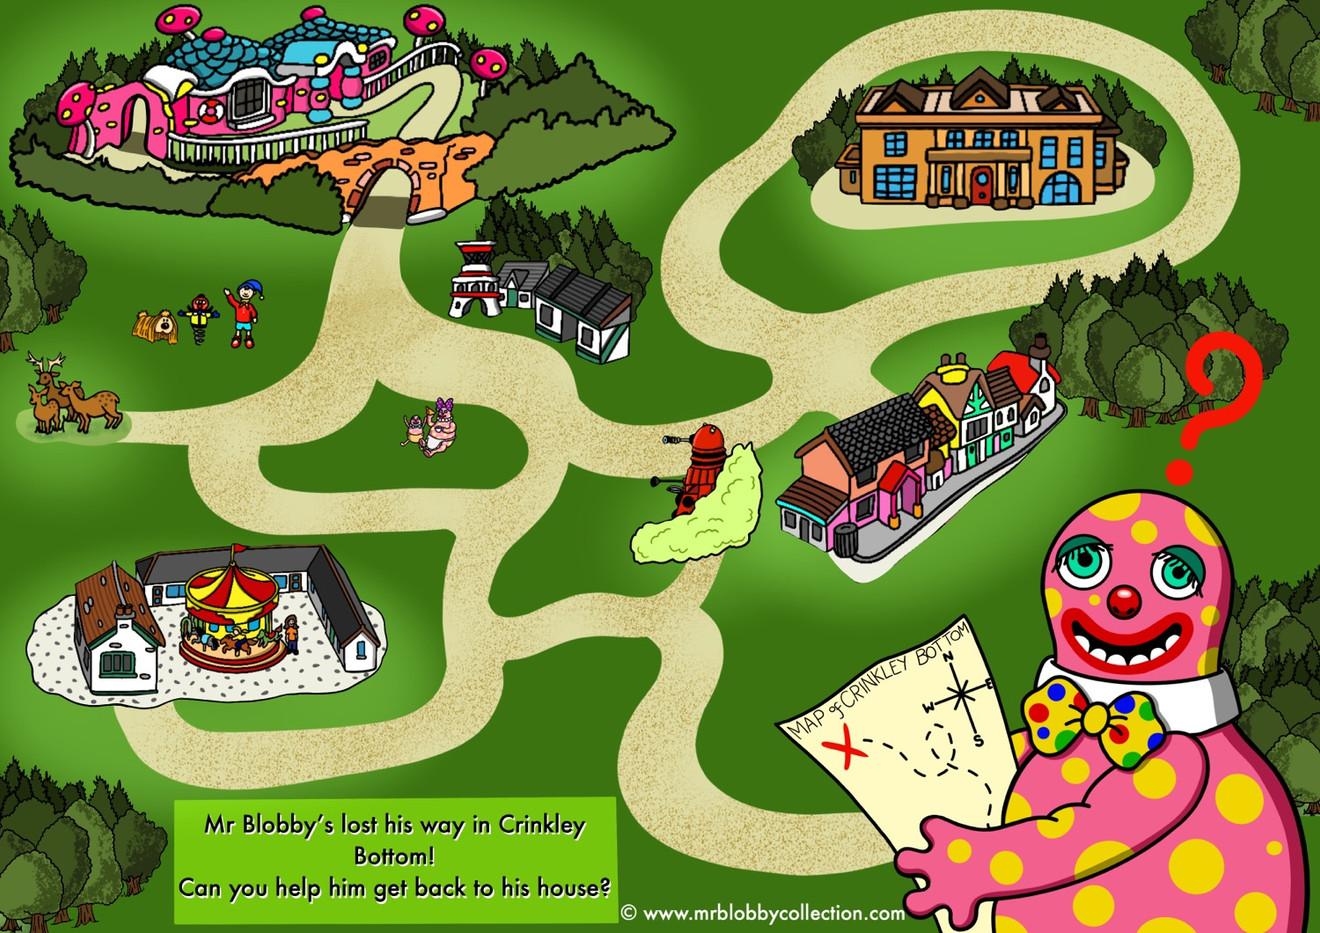 Crinkley Bottom Maze